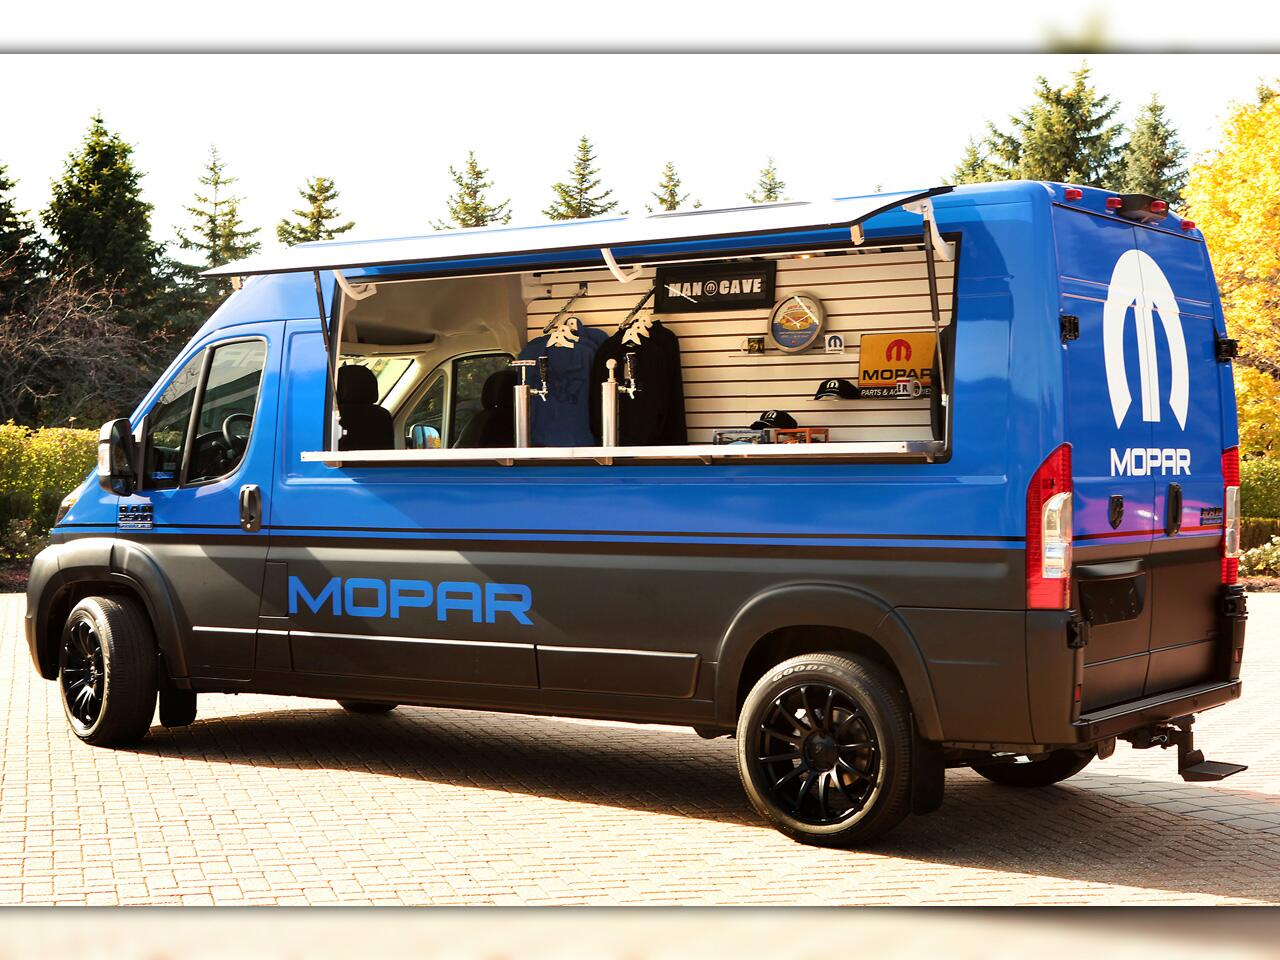 Bild zu Ram ProMaster Hospitality Van